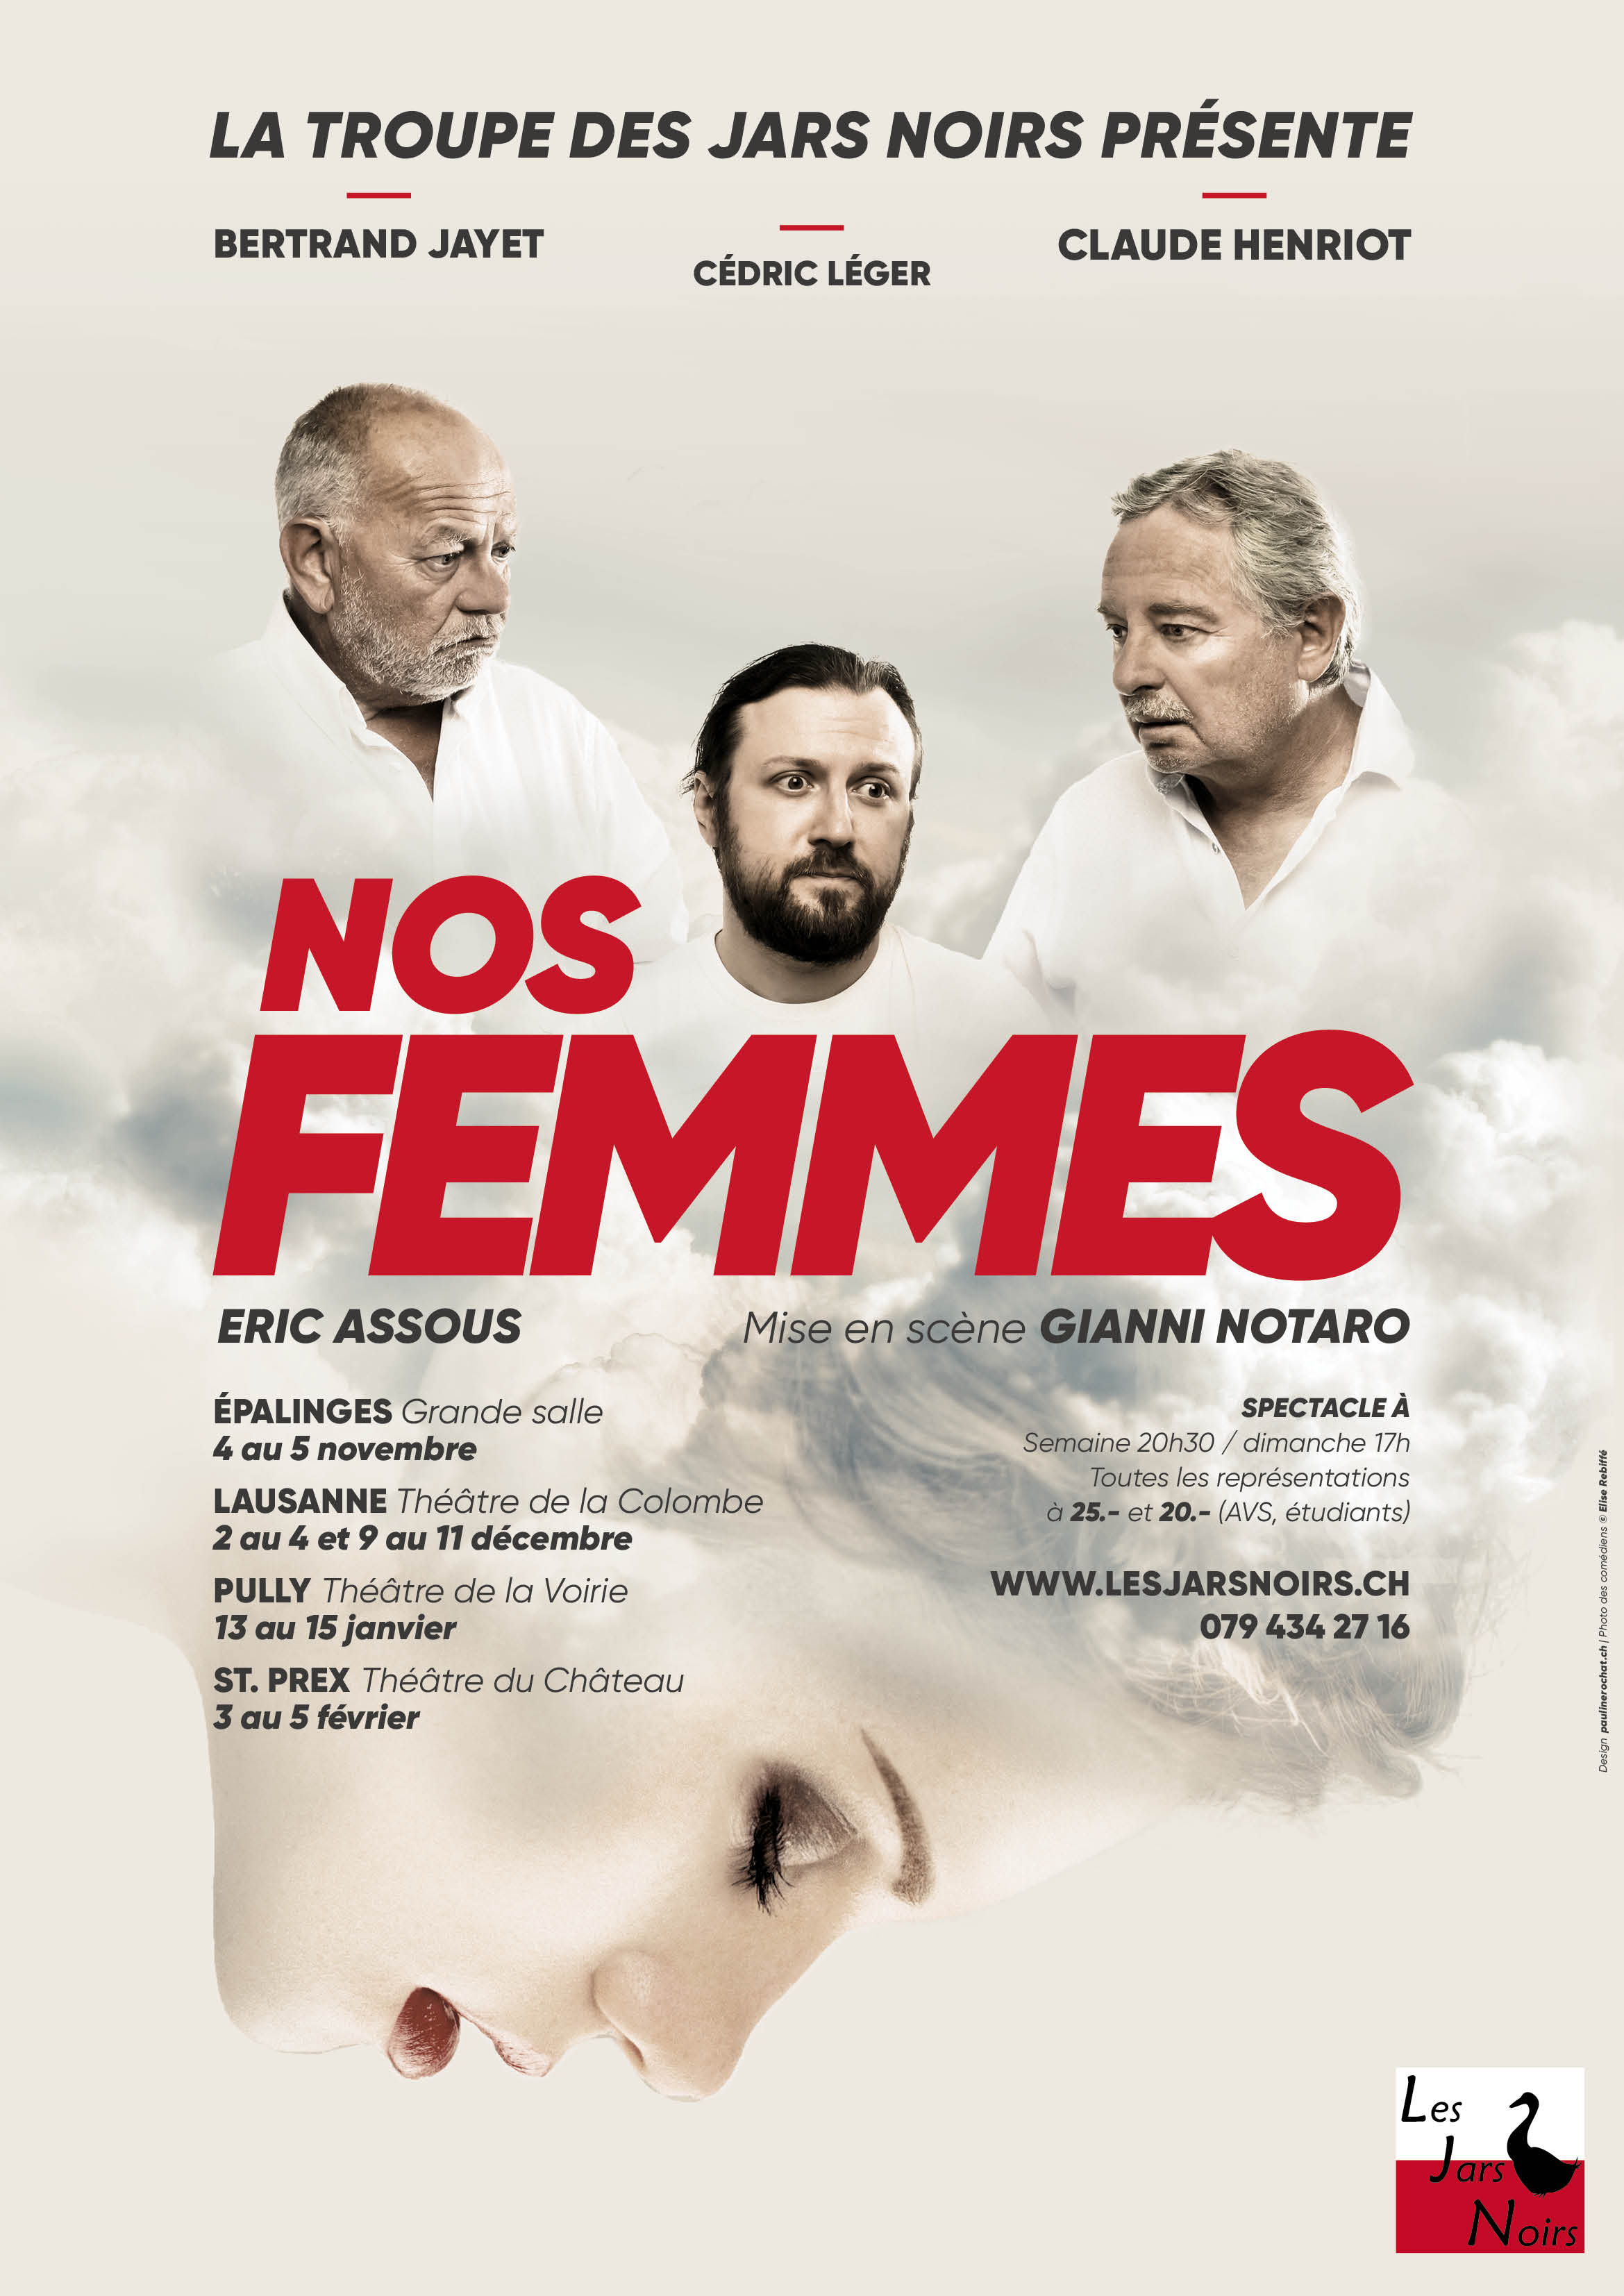 jares_noirs_nos_femmes_20160905